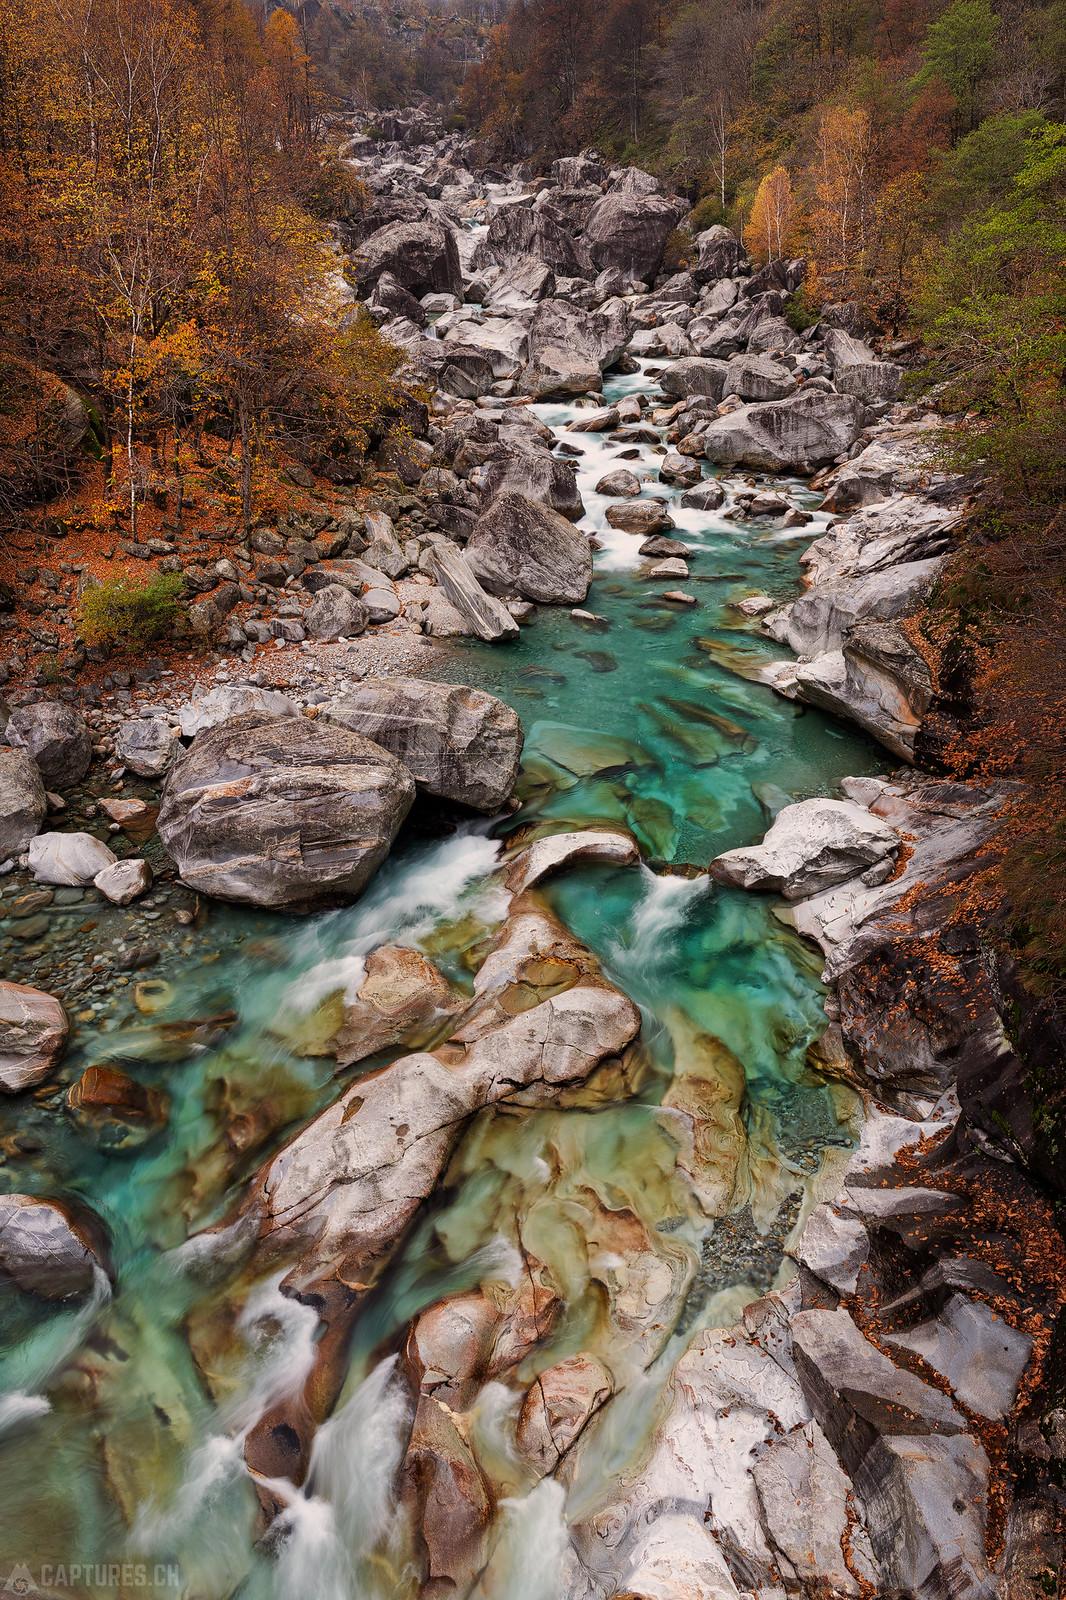 Green river - Verzasca